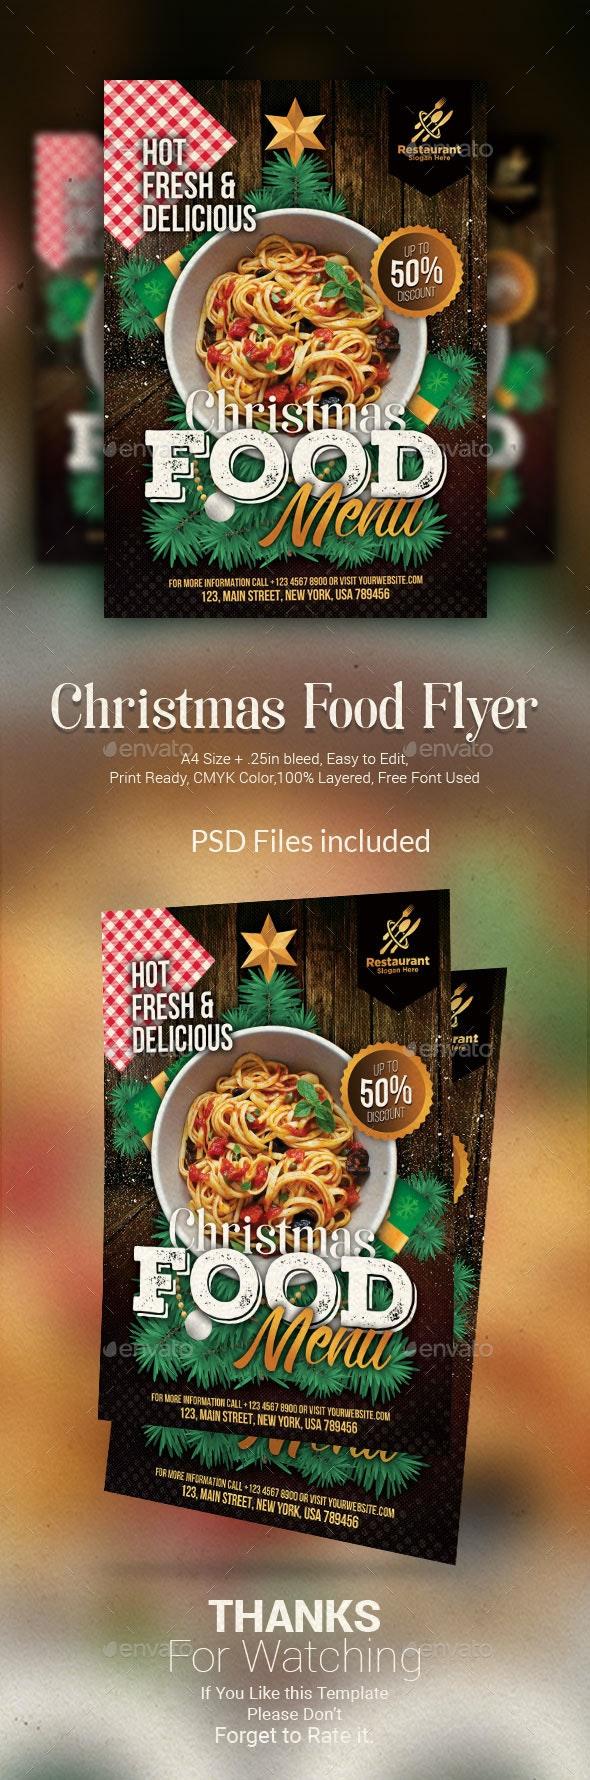 Christmas Food Flyer - Restaurant Flyers